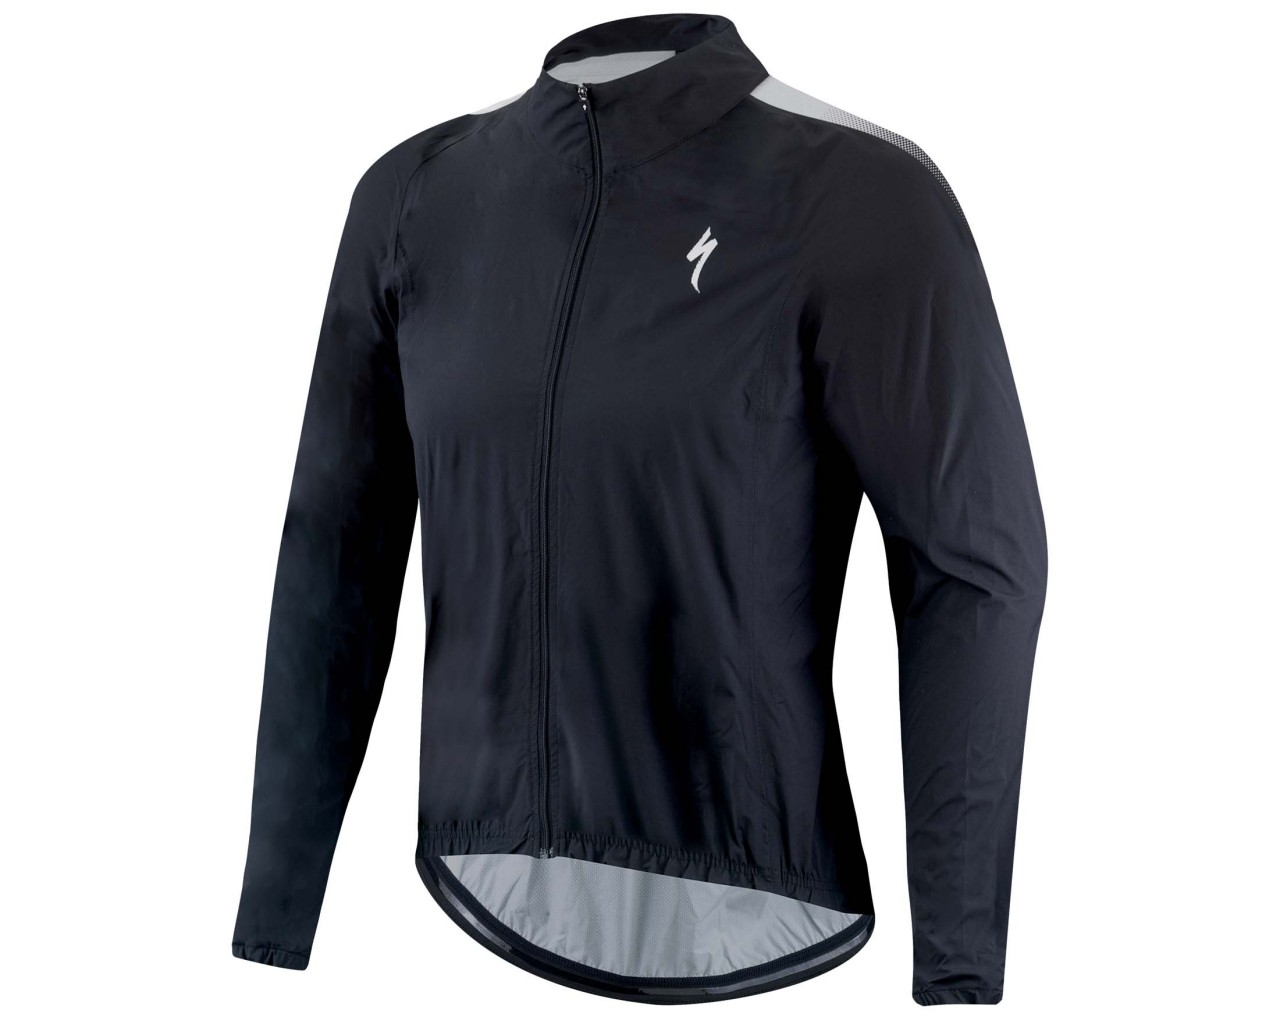 Specialized Deflect RBX Pro Hi-Vis Rain Jacket   black